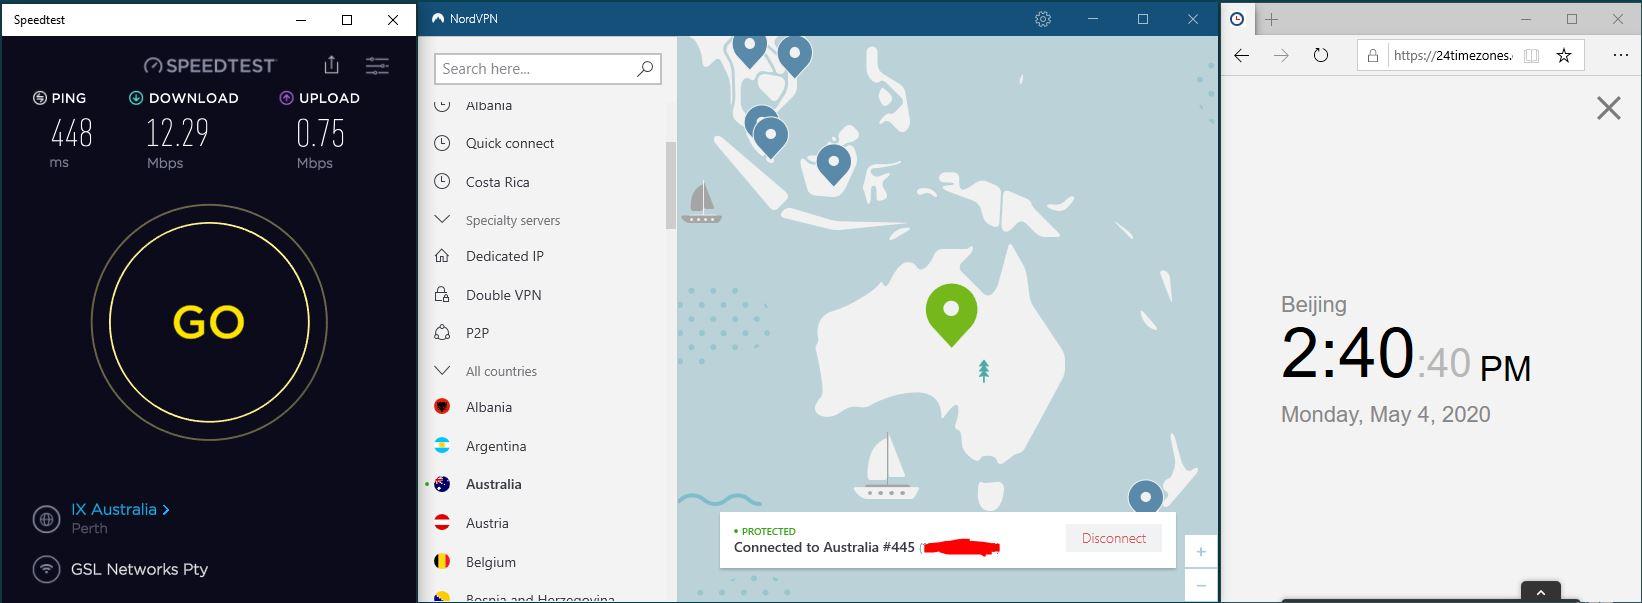 Windows10 NordVPN 混淆协议关闭 Australia #445 中国VPN 翻墙 科学上网 SpeedTest测速-20200504